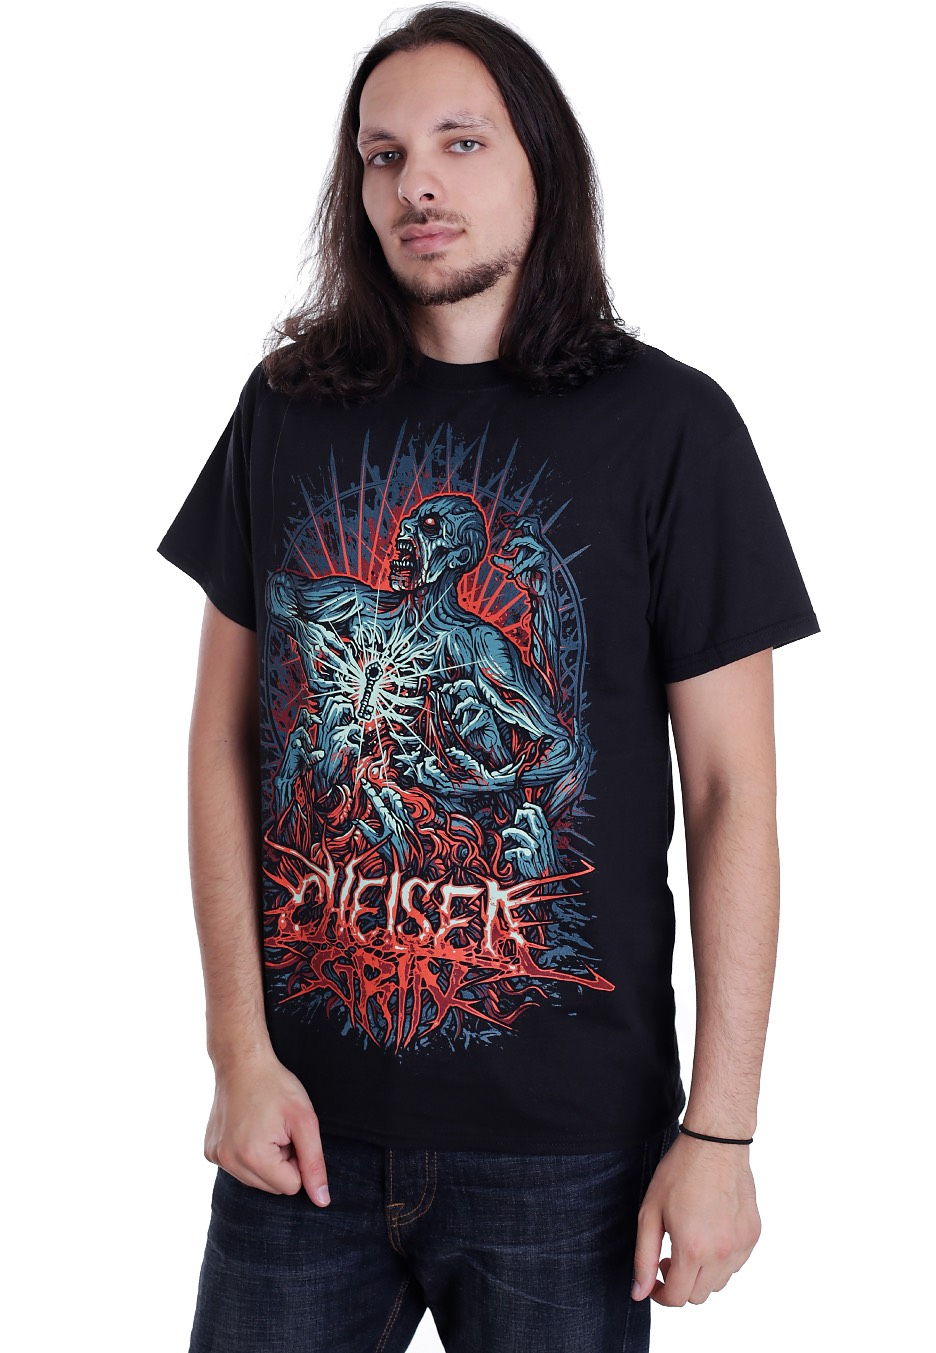 chelsea grin demon t shirt official deathcore merchandise shop worldwide. Black Bedroom Furniture Sets. Home Design Ideas